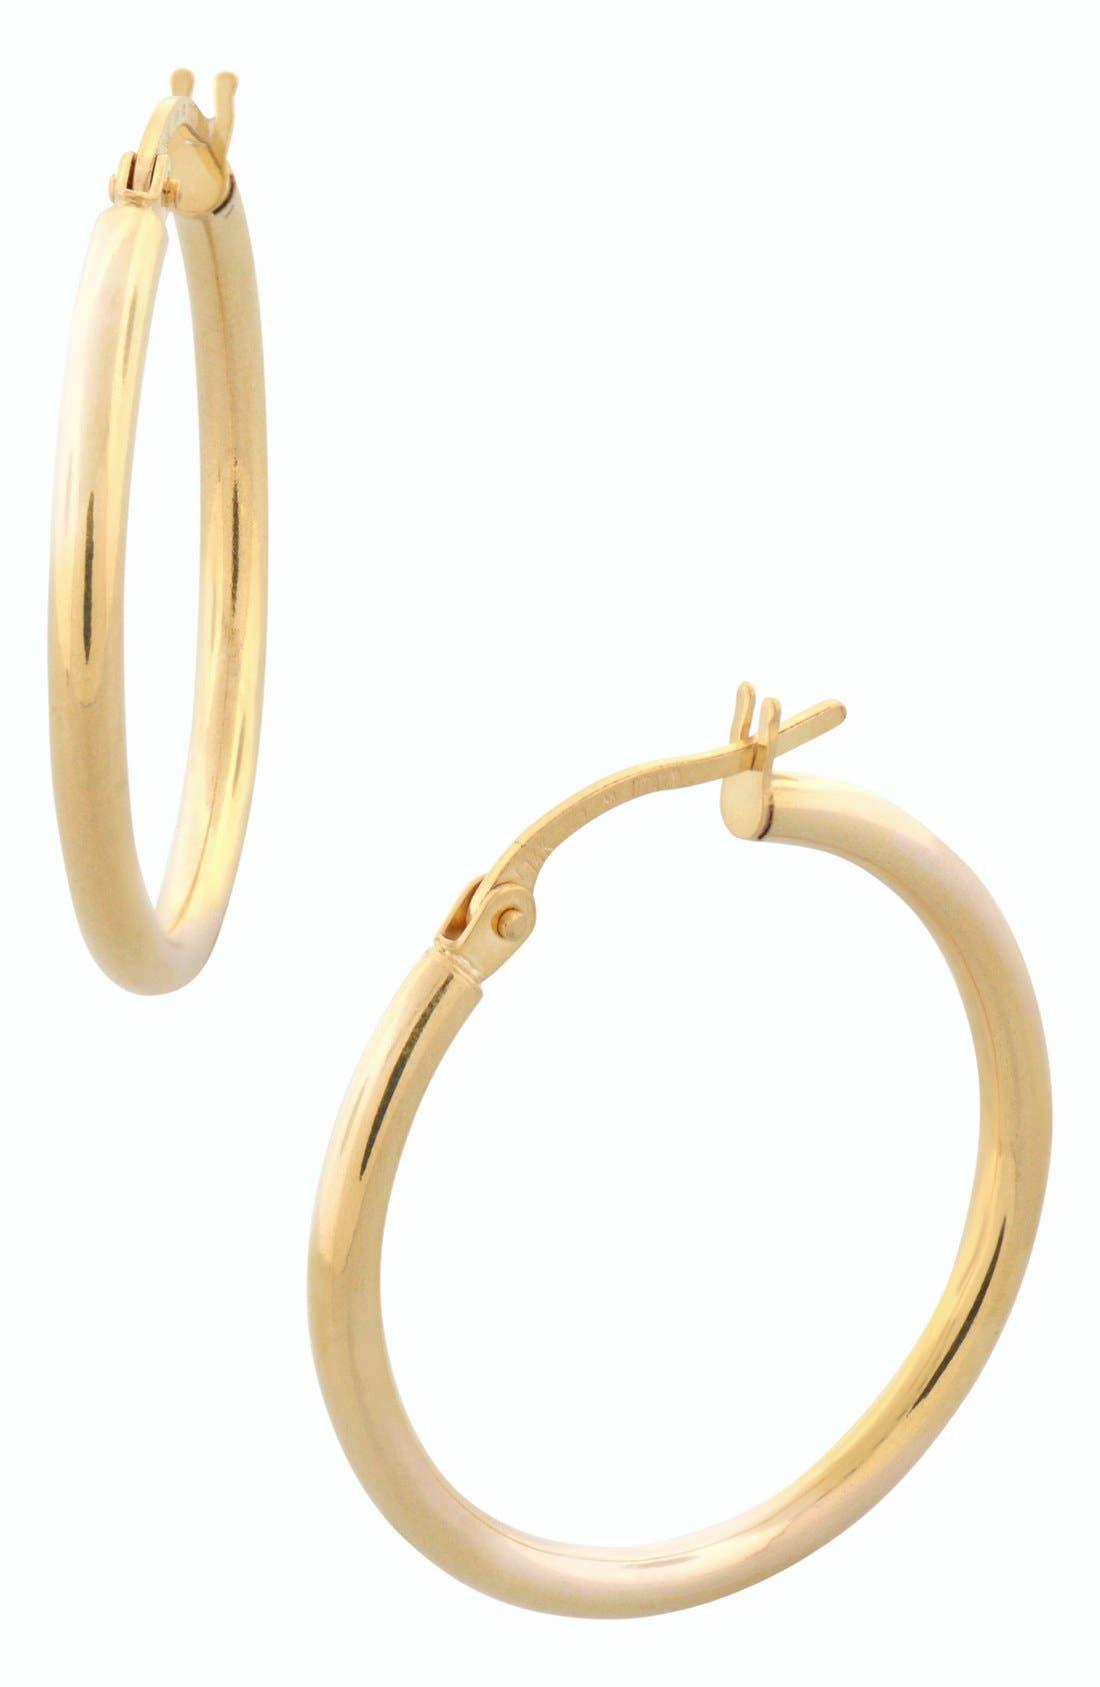 14k Gold Hoop Earrings,                         Main,                         color, Yellow Gold